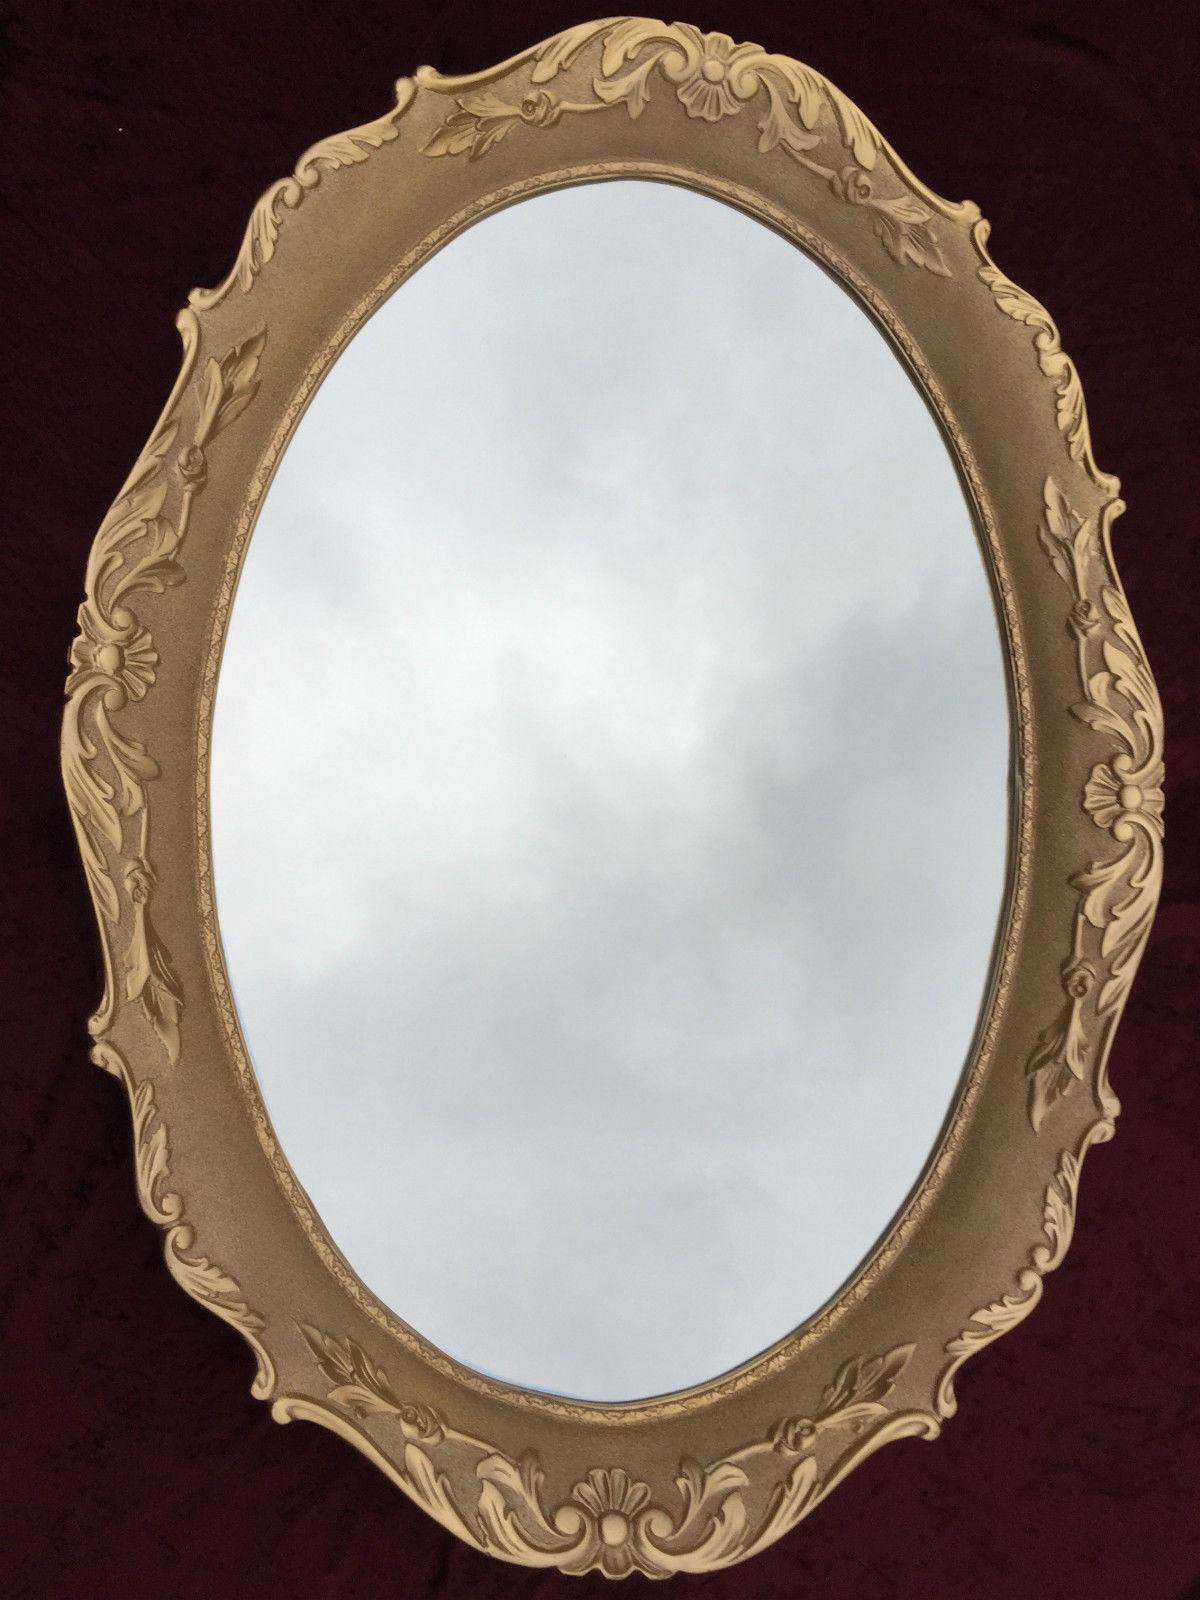 grosser wandspiegel barock 107x80 cm oval antik rahmen mirror model erya kaufen bei pintici. Black Bedroom Furniture Sets. Home Design Ideas